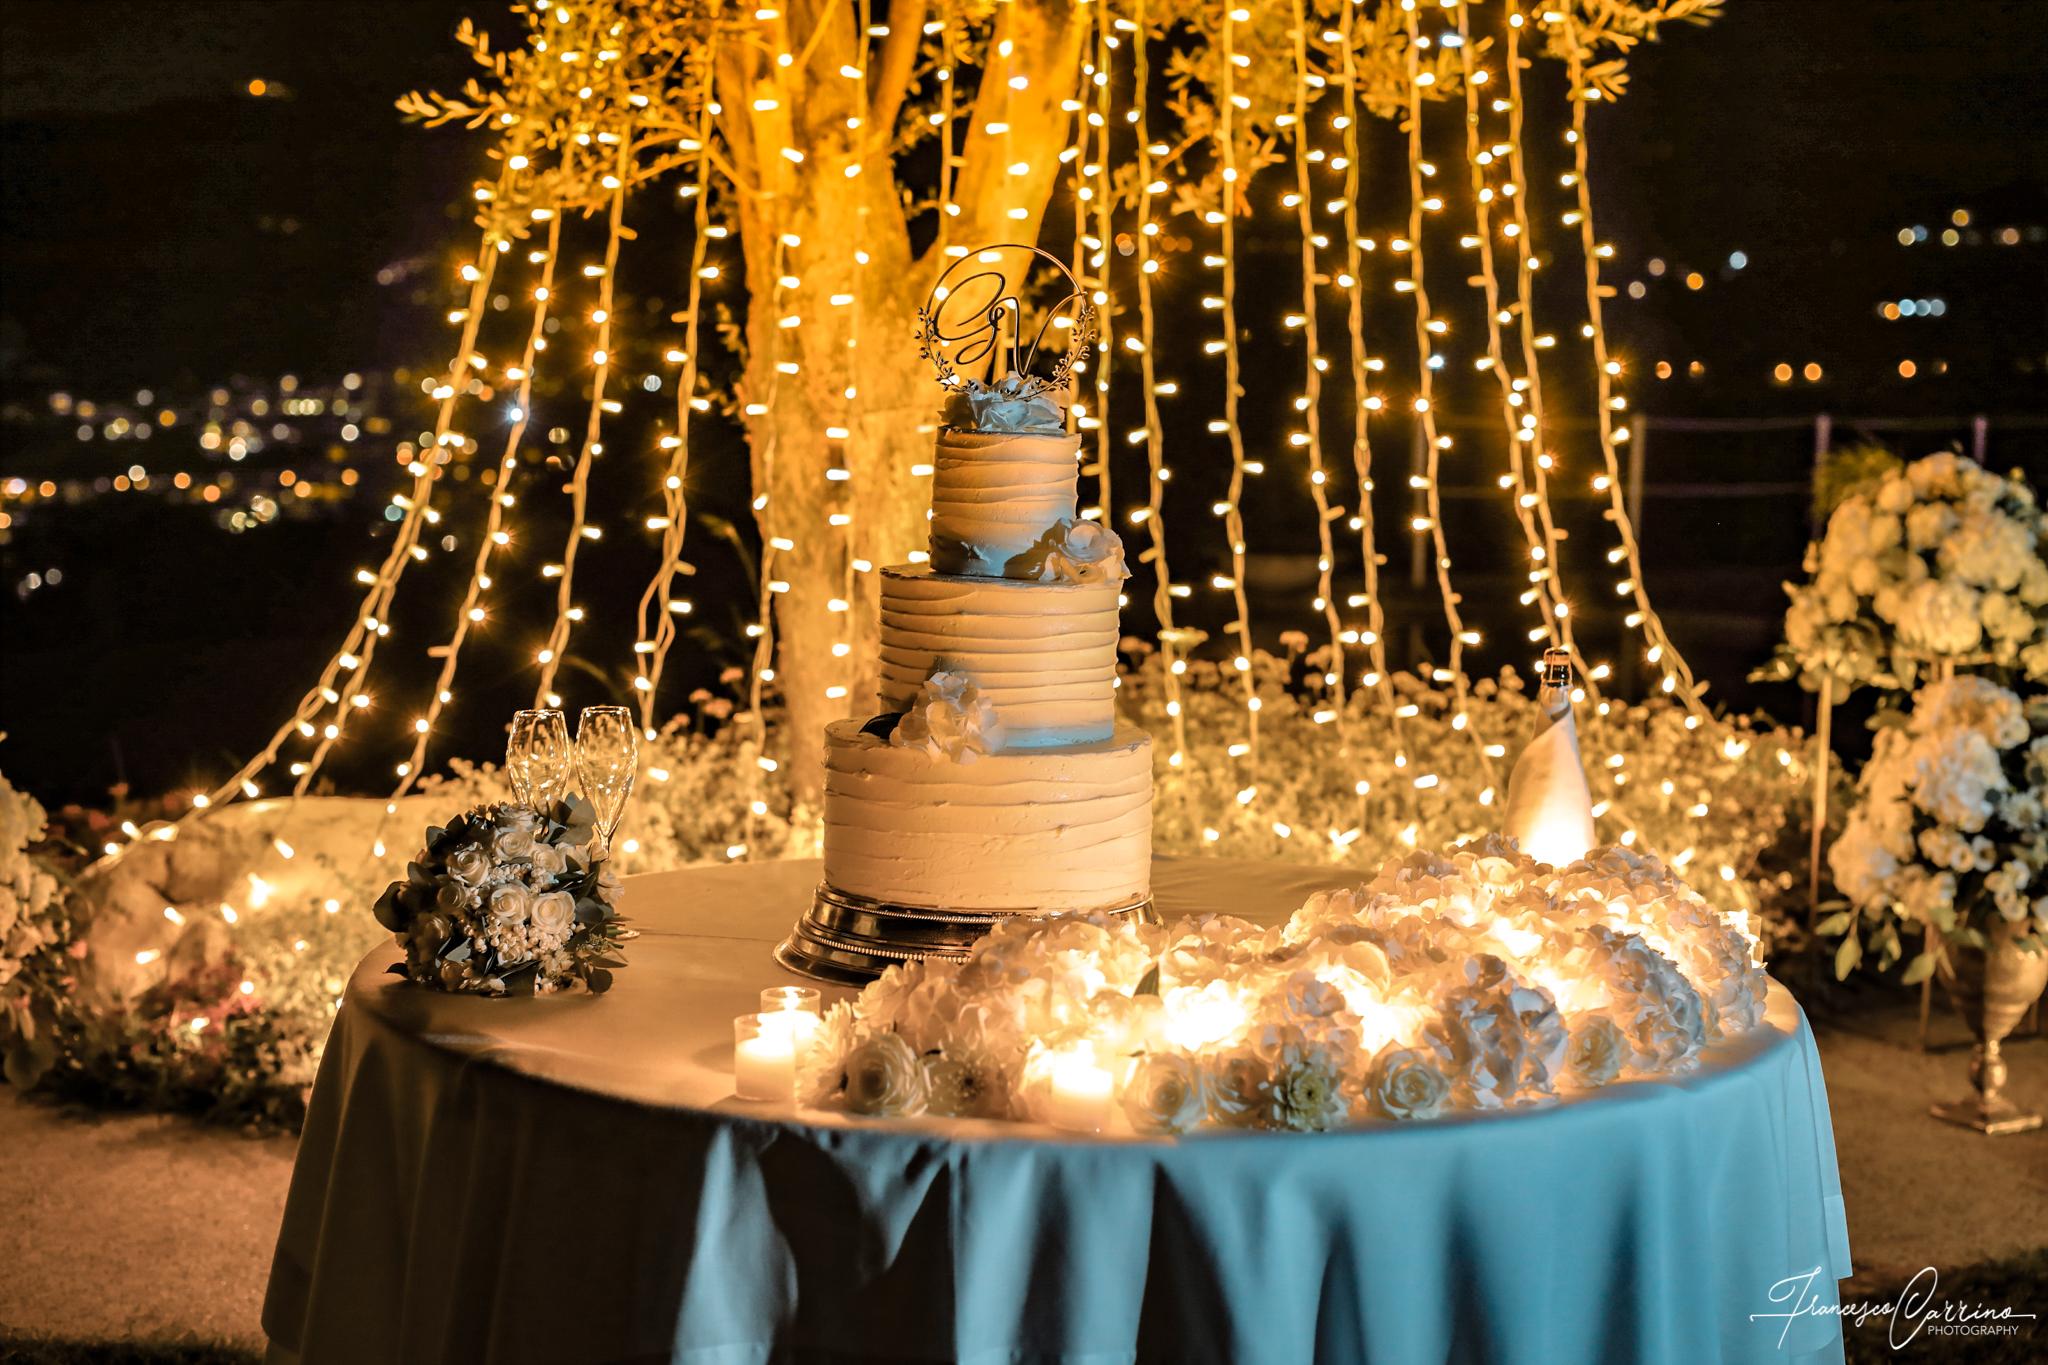 https://www.weddingamalfi.com/wp-content/uploads/Giannenza-13-luglio-2019-25.jpg